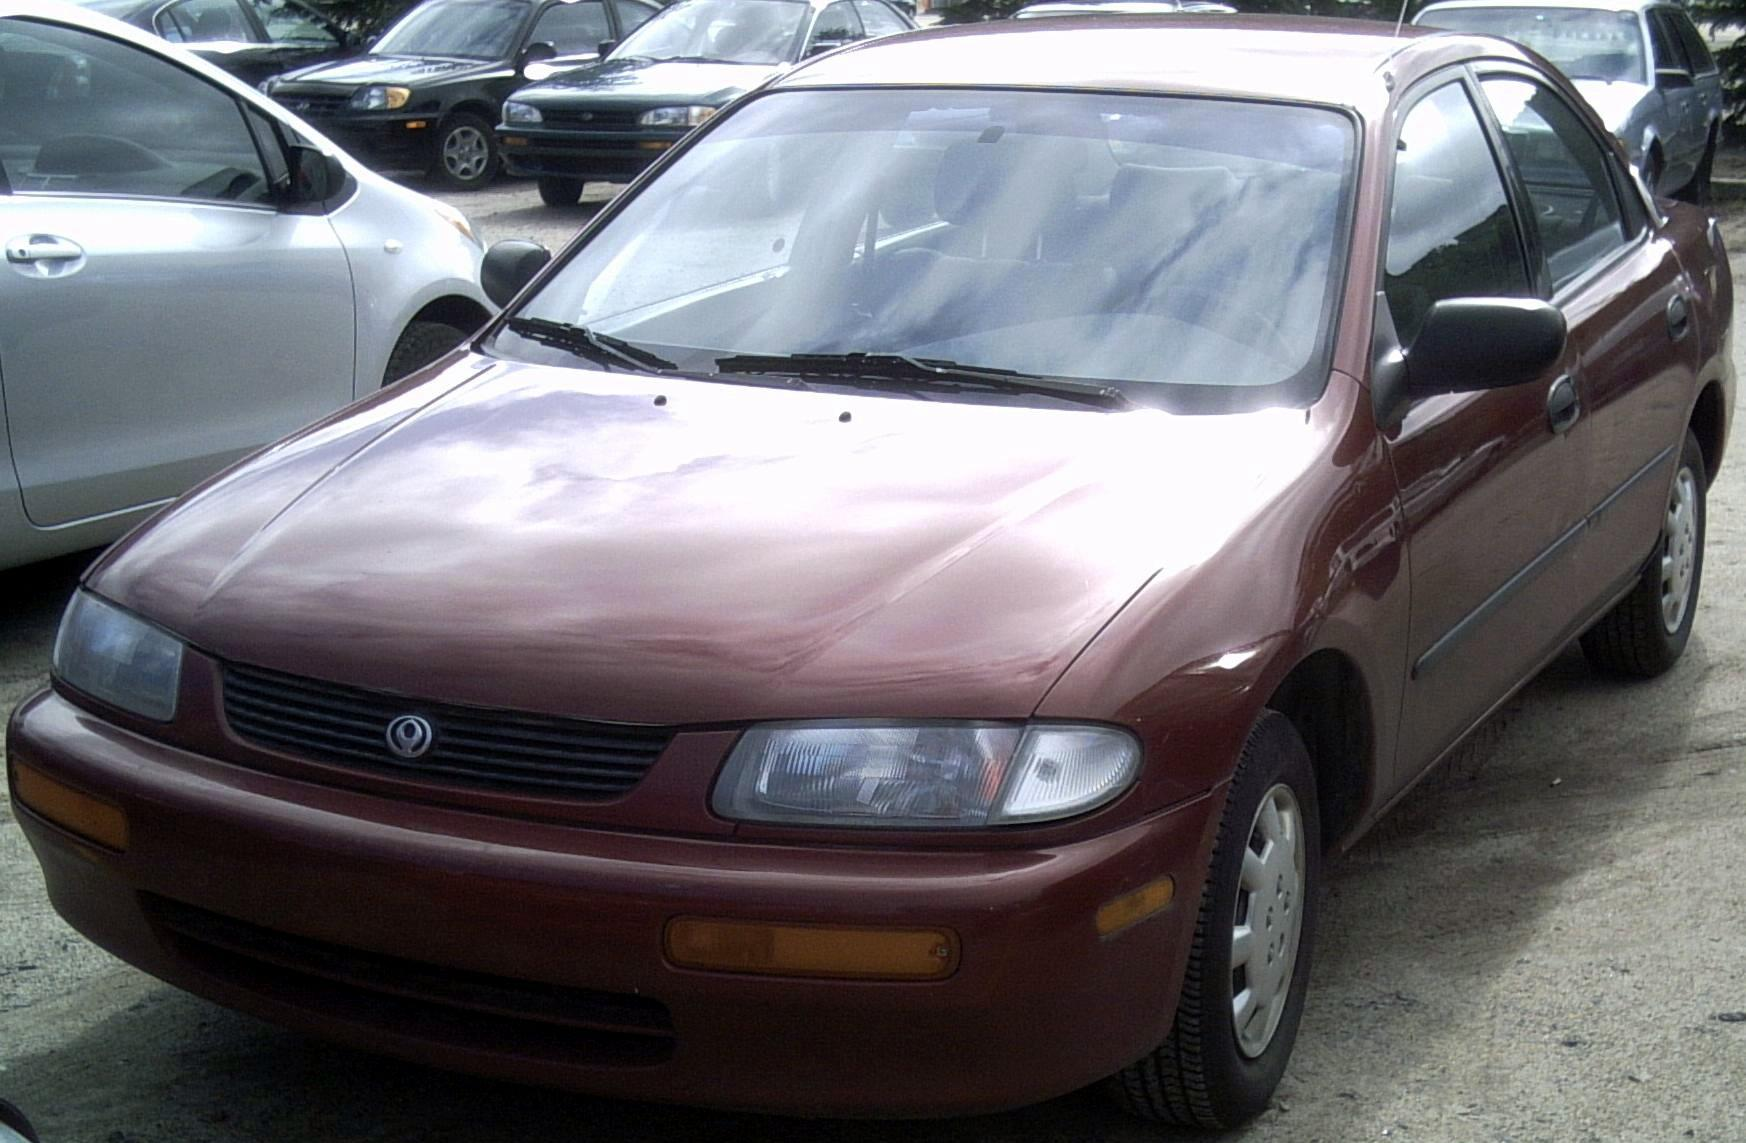 1995 Mazda Protege Wiring 56 Chevy Fuse Box Diagram 1991rx7 Ati Loro Jeanjaures37 Fr